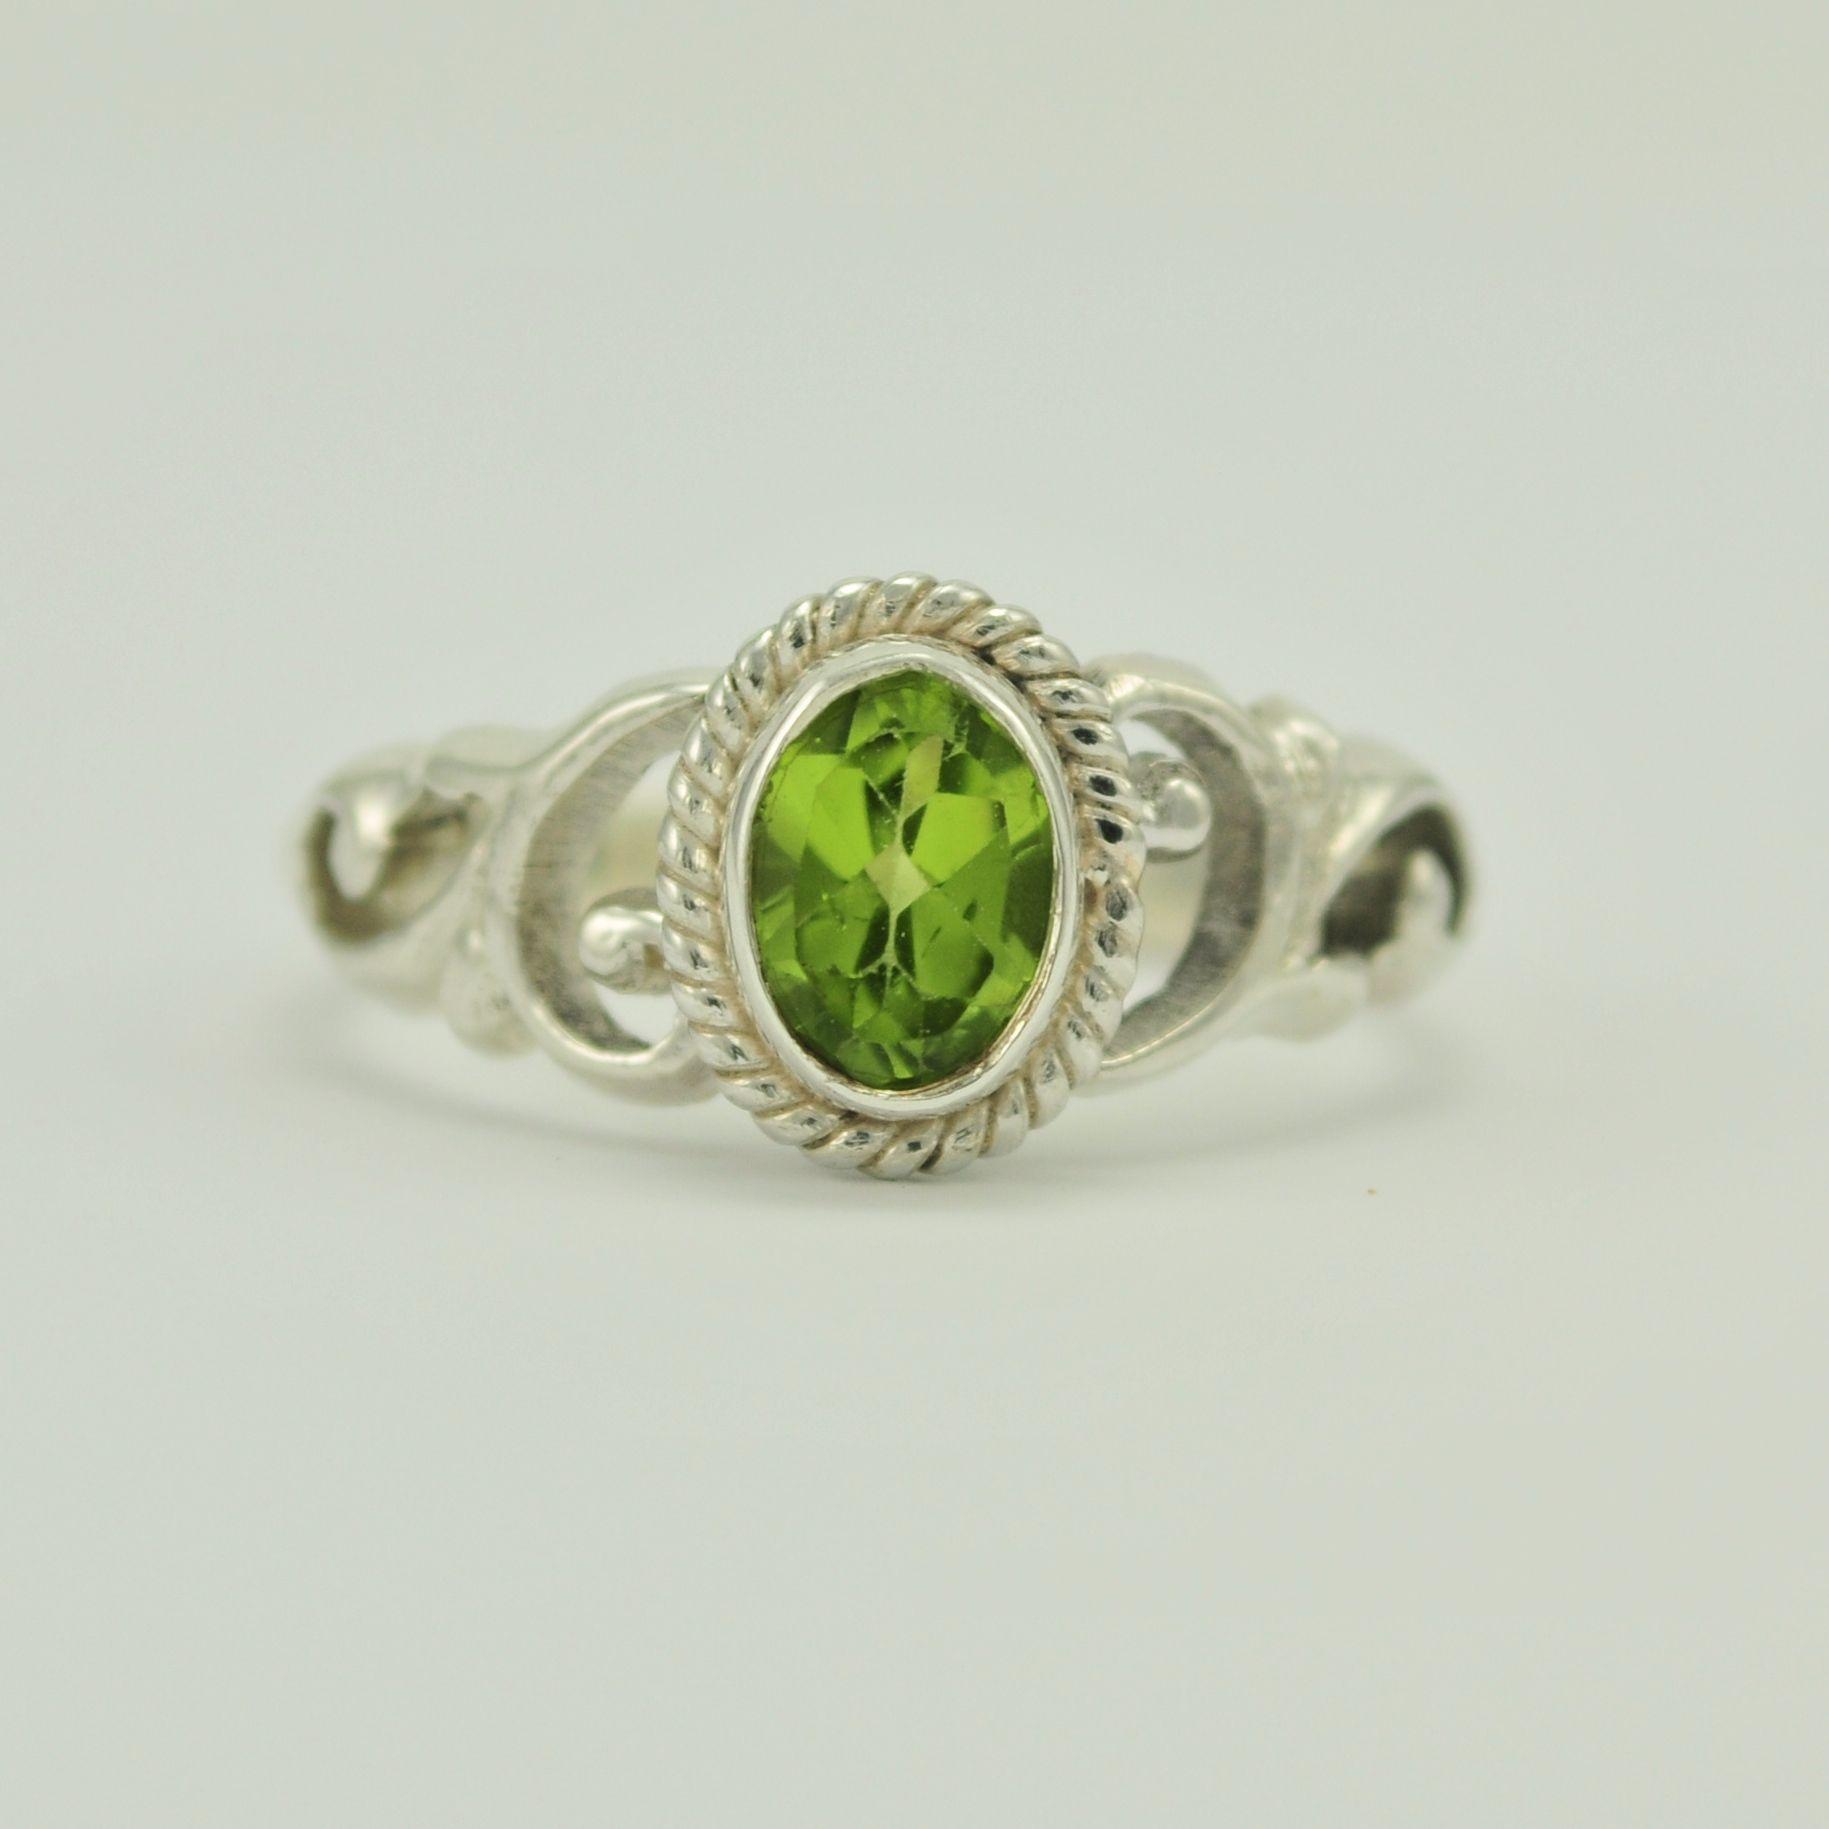 Sterling Silver Peridot Ring Handmade in Nepal